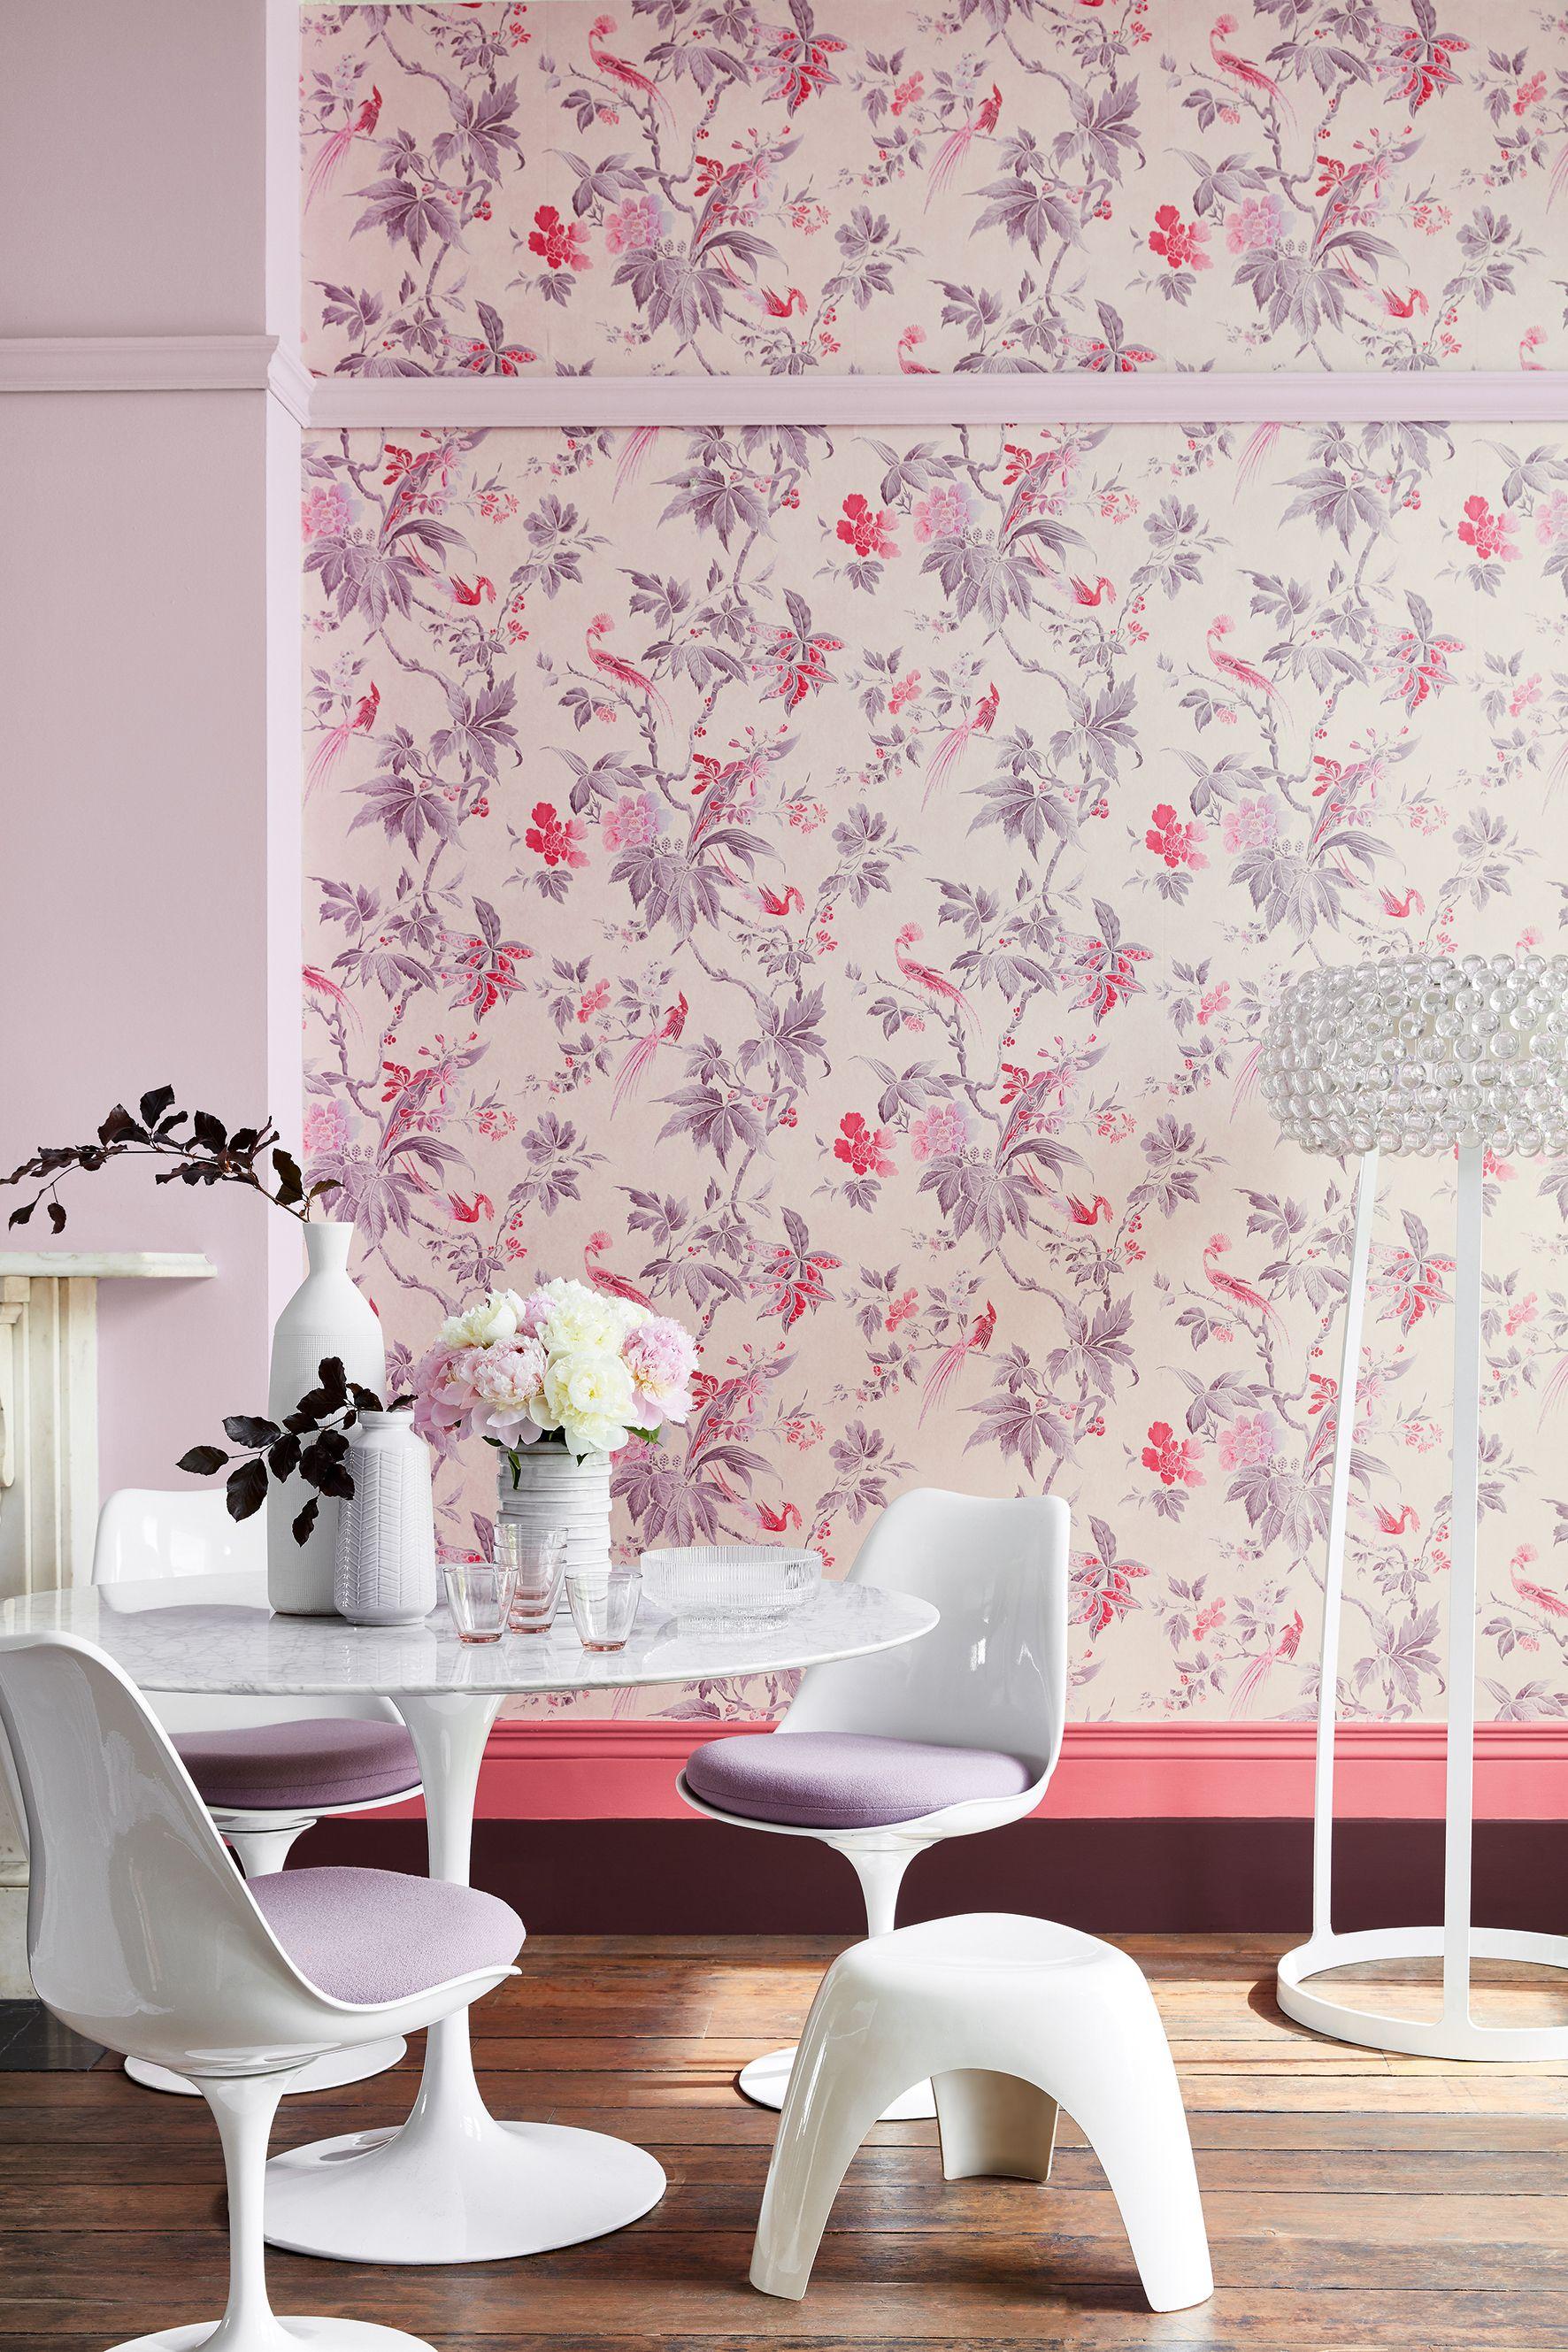 Paradise Pink Hortense 266 Carmine 189 Cordoba 277 The  # Muebles German Cordoba Capital